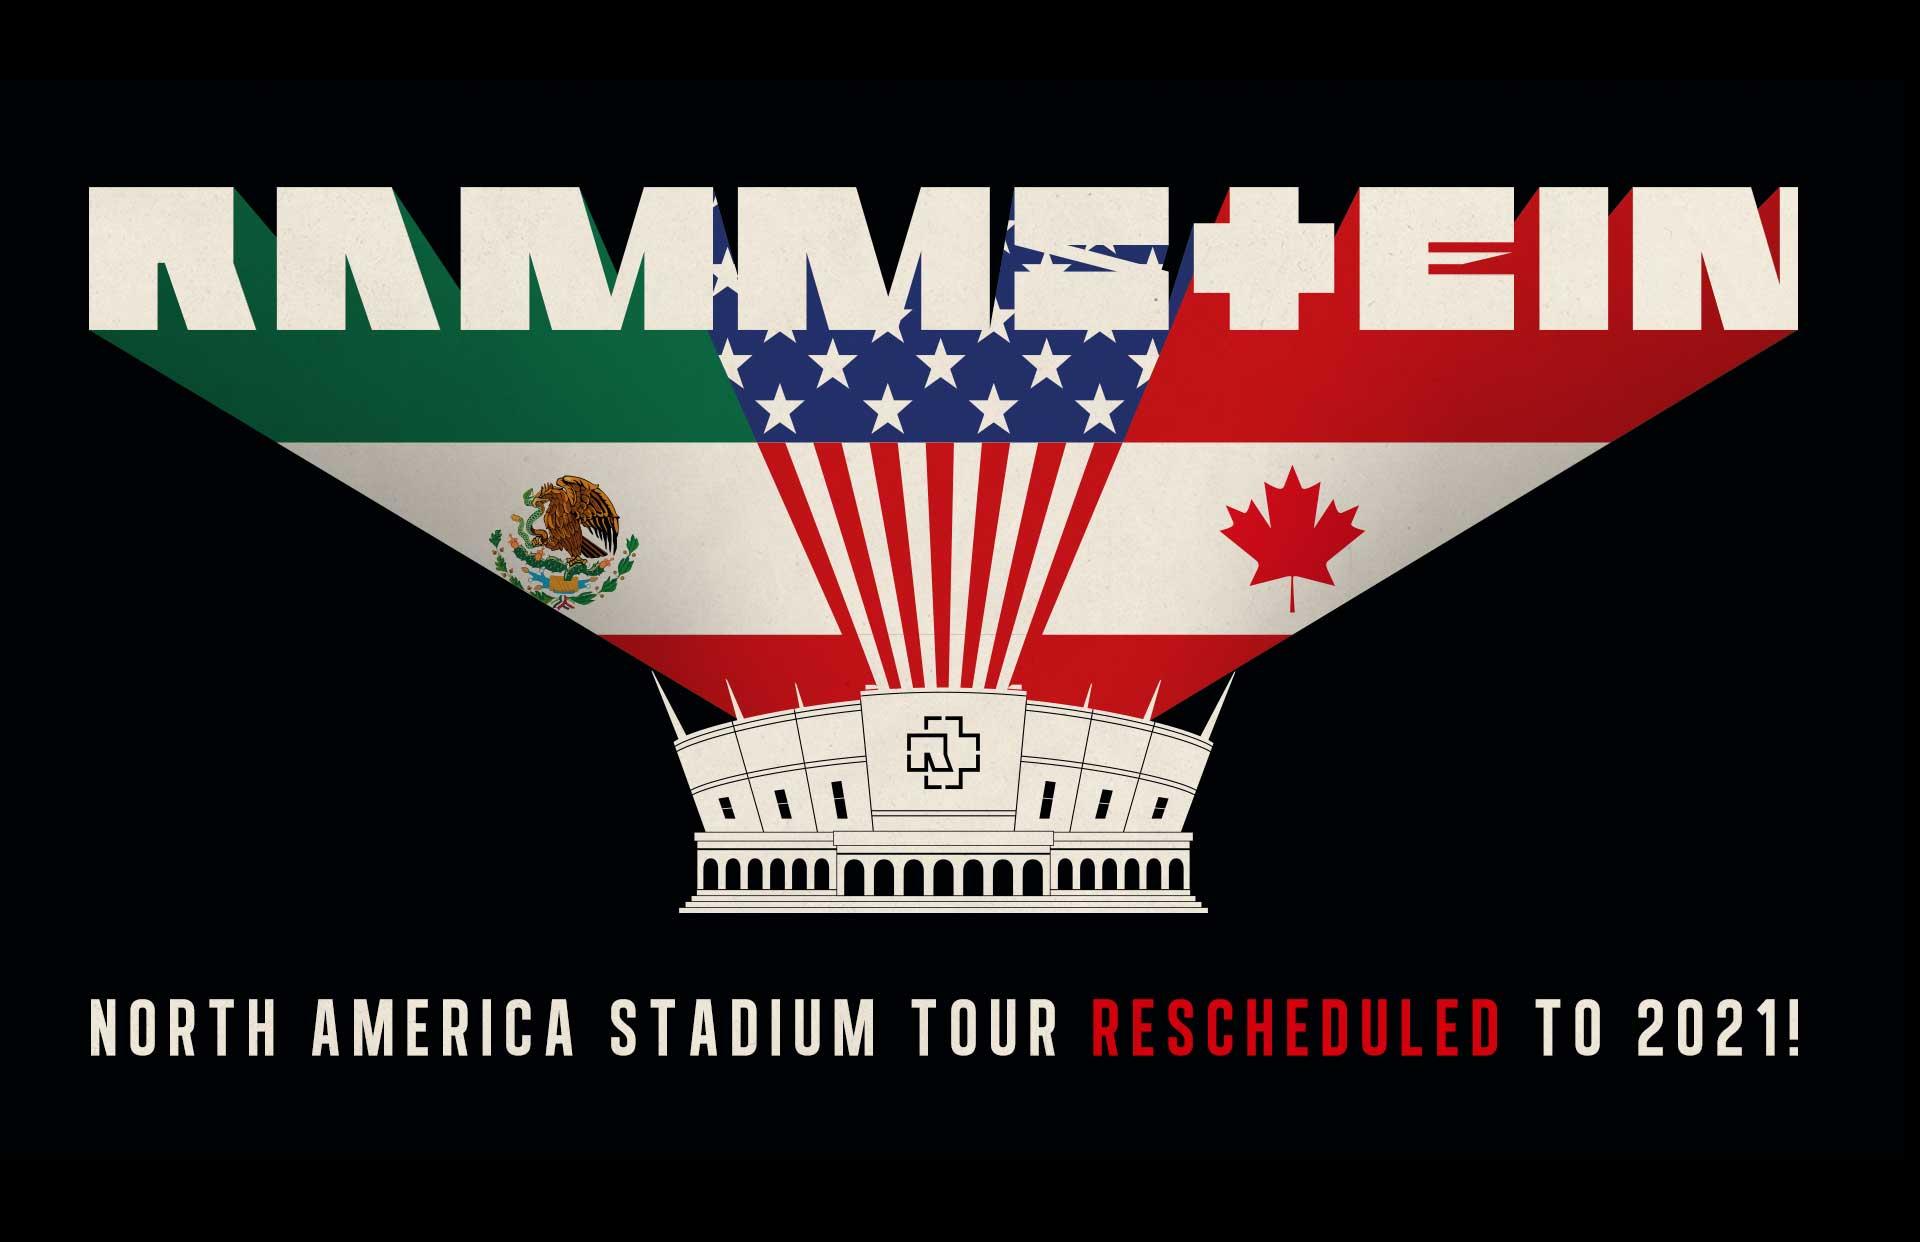 Rammstein North American Tour Dates - Rescheduled for 2021 Calendar